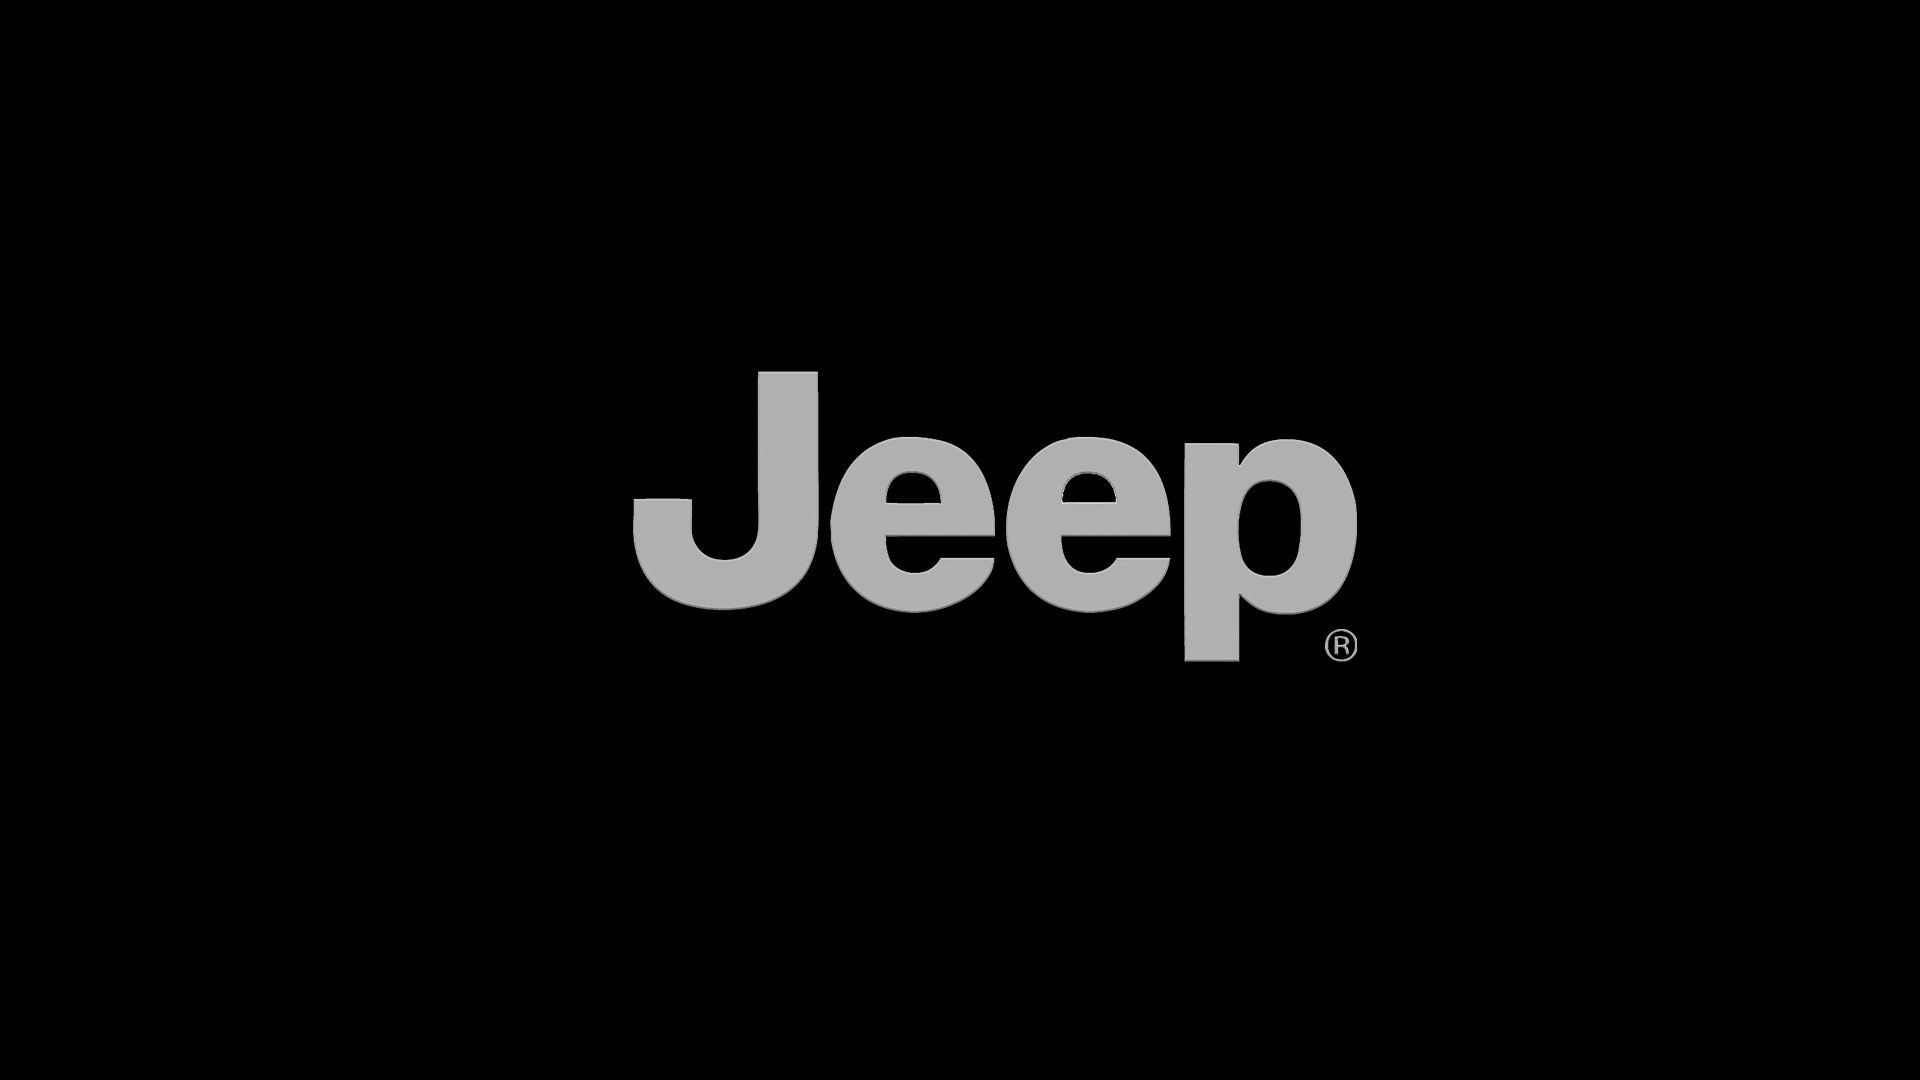 dark jeep logo wallpaper 66854